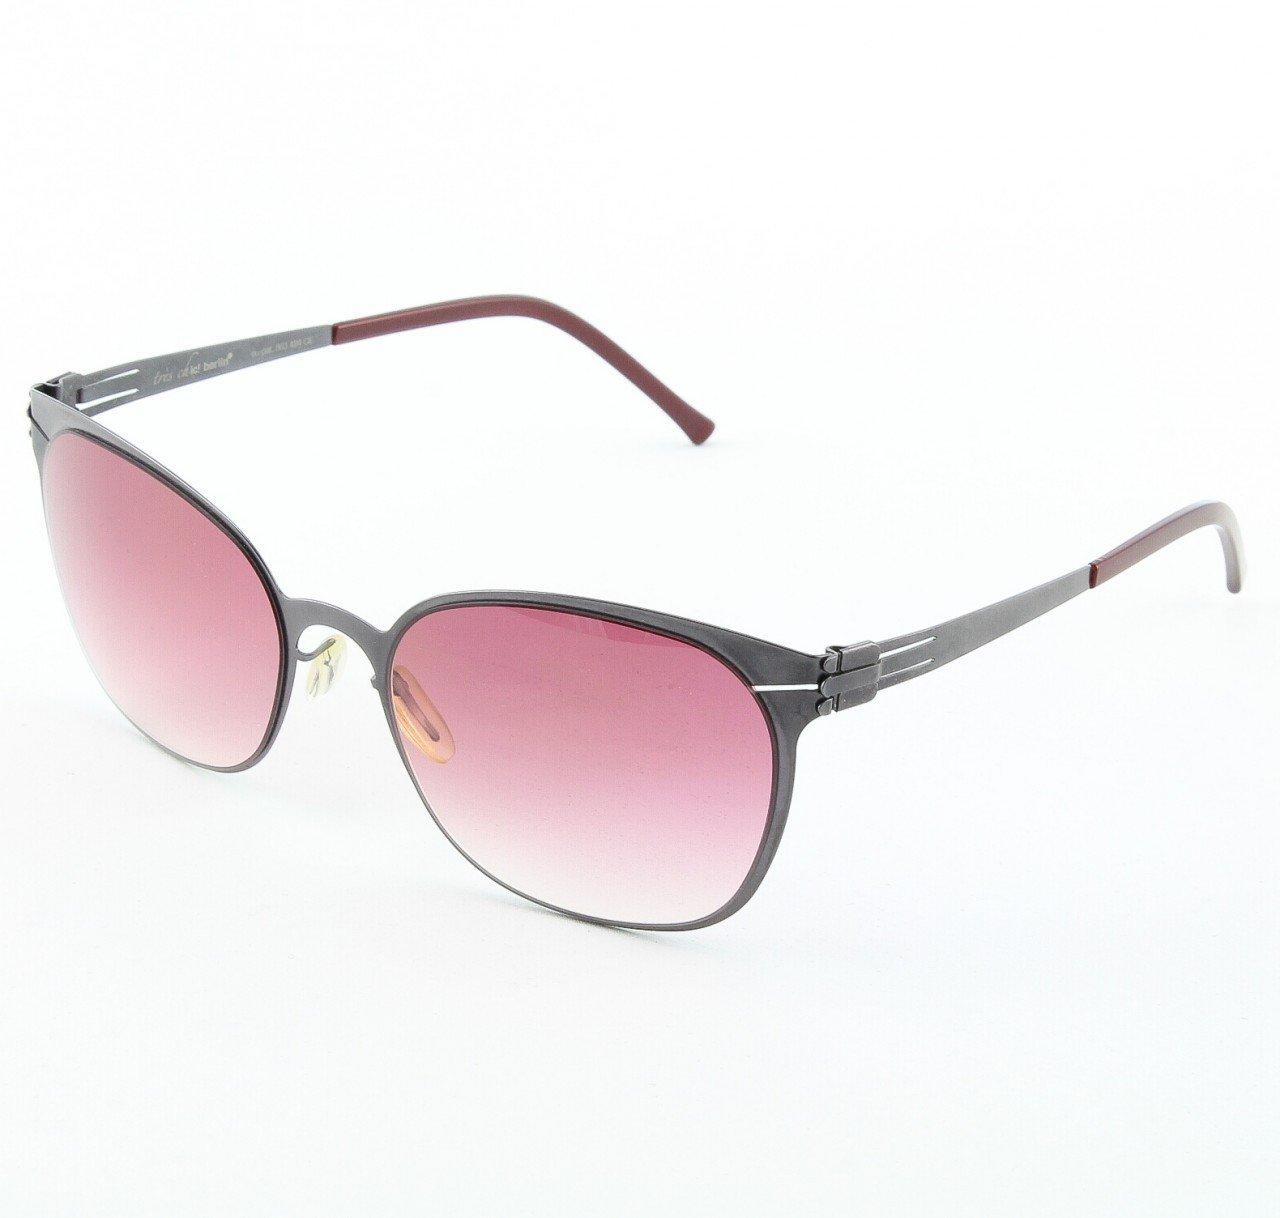 ic! Berlin Samedi Sunglasses Col. Aubergine with Rose Gradient Lenses